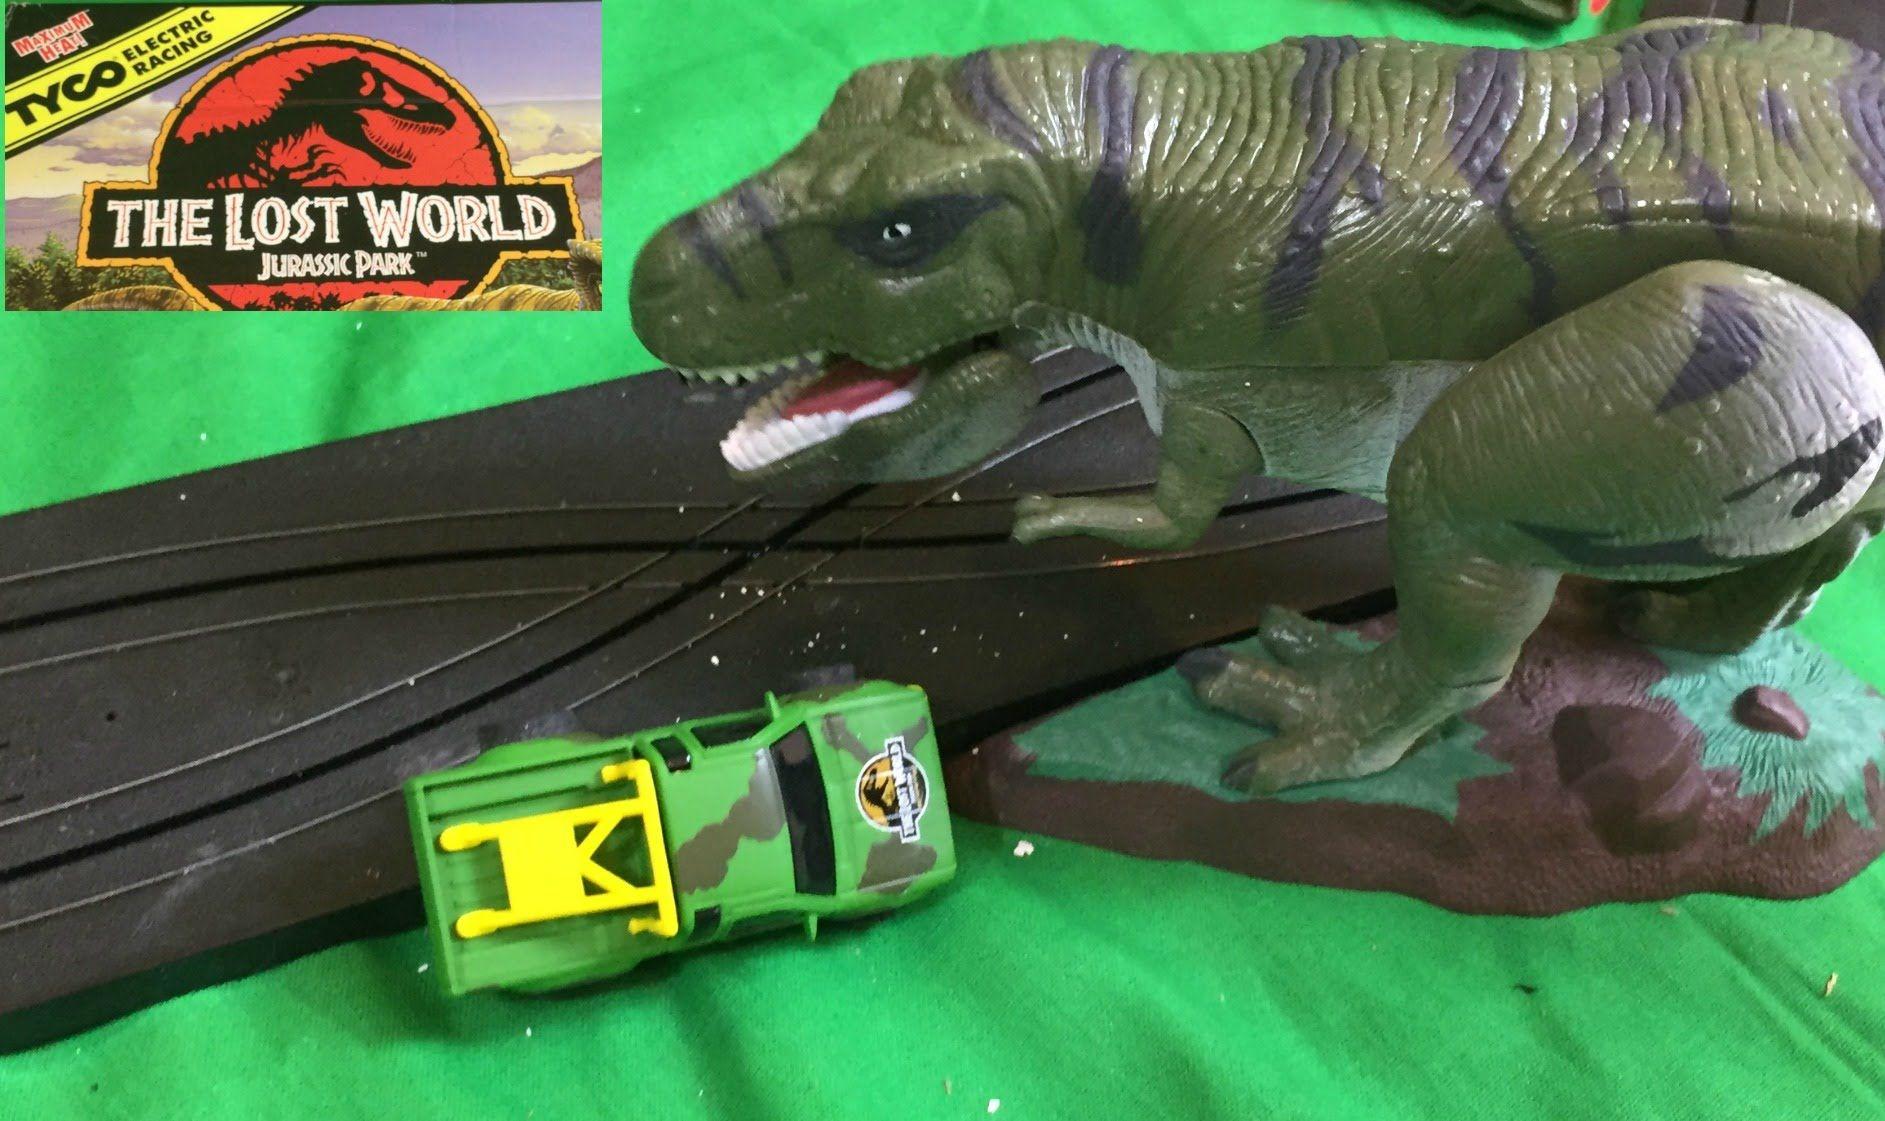 Tyco Jurassic Park Lost World Electric Slot Car Set T Rex Dinosaur Attack Slot Car Sets Jurassic Park Car